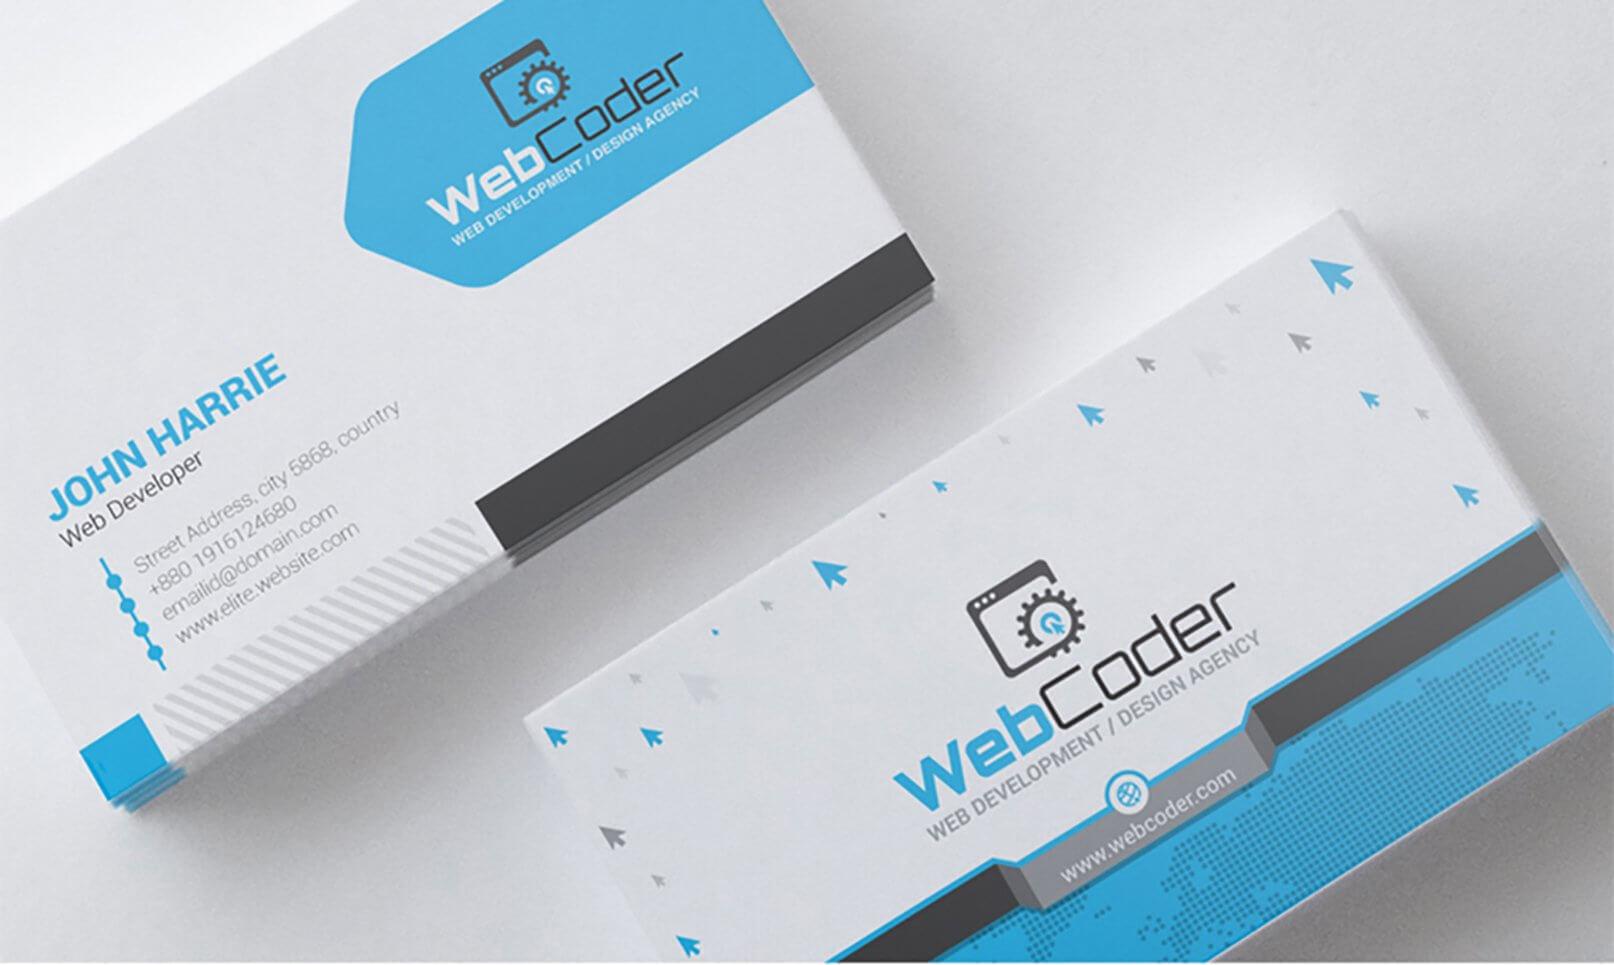 Website Design Business Cards - Calep.midnightpig.co Regarding Web Design Business Cards Templates